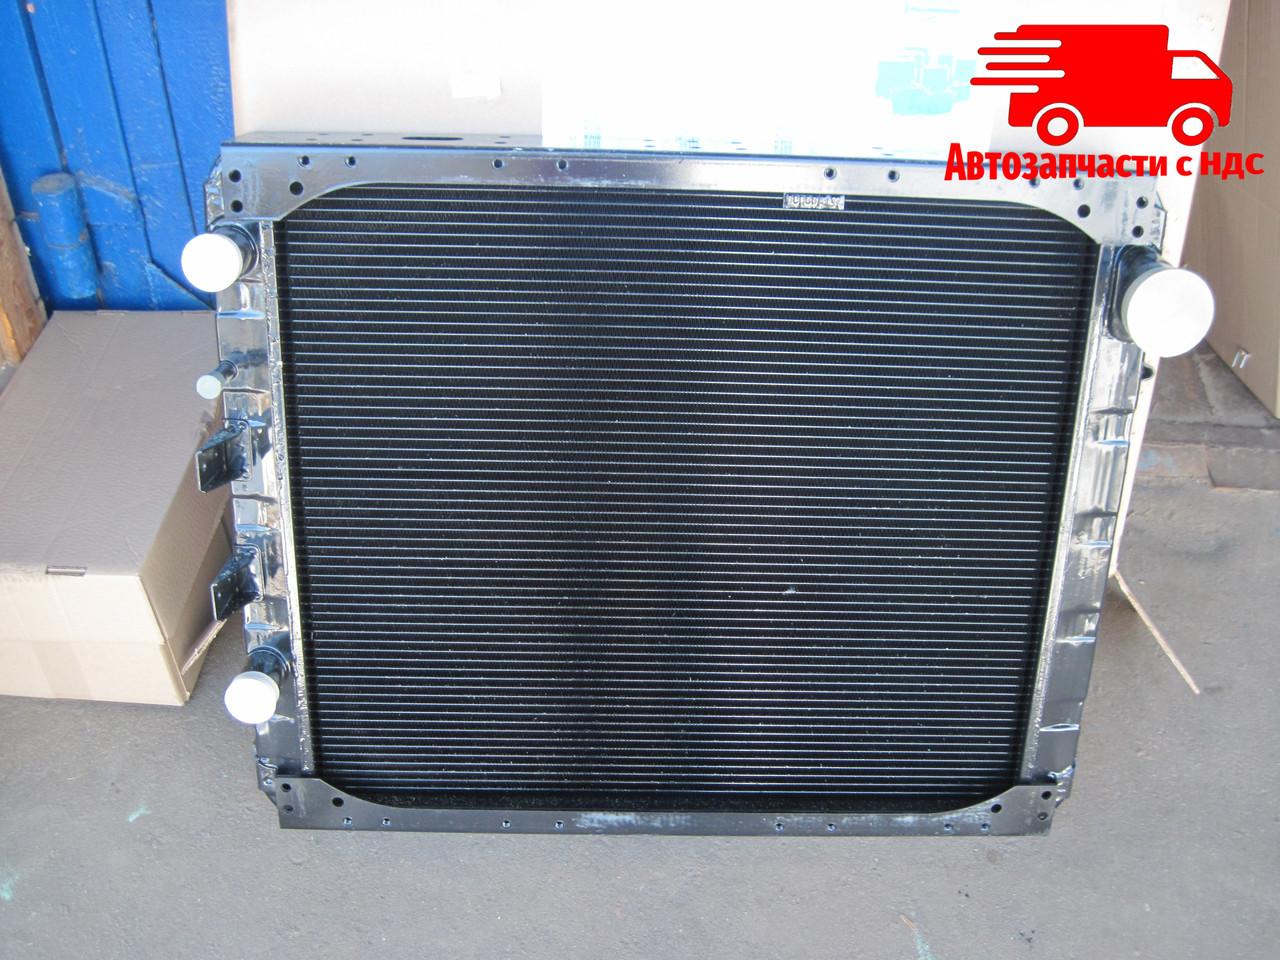 Радиатор водяного охлаждения МАЗ 642290 (3 рядный) (пр-во ШААЗ). 642290-1301010-011. Ціна з ПДВ.